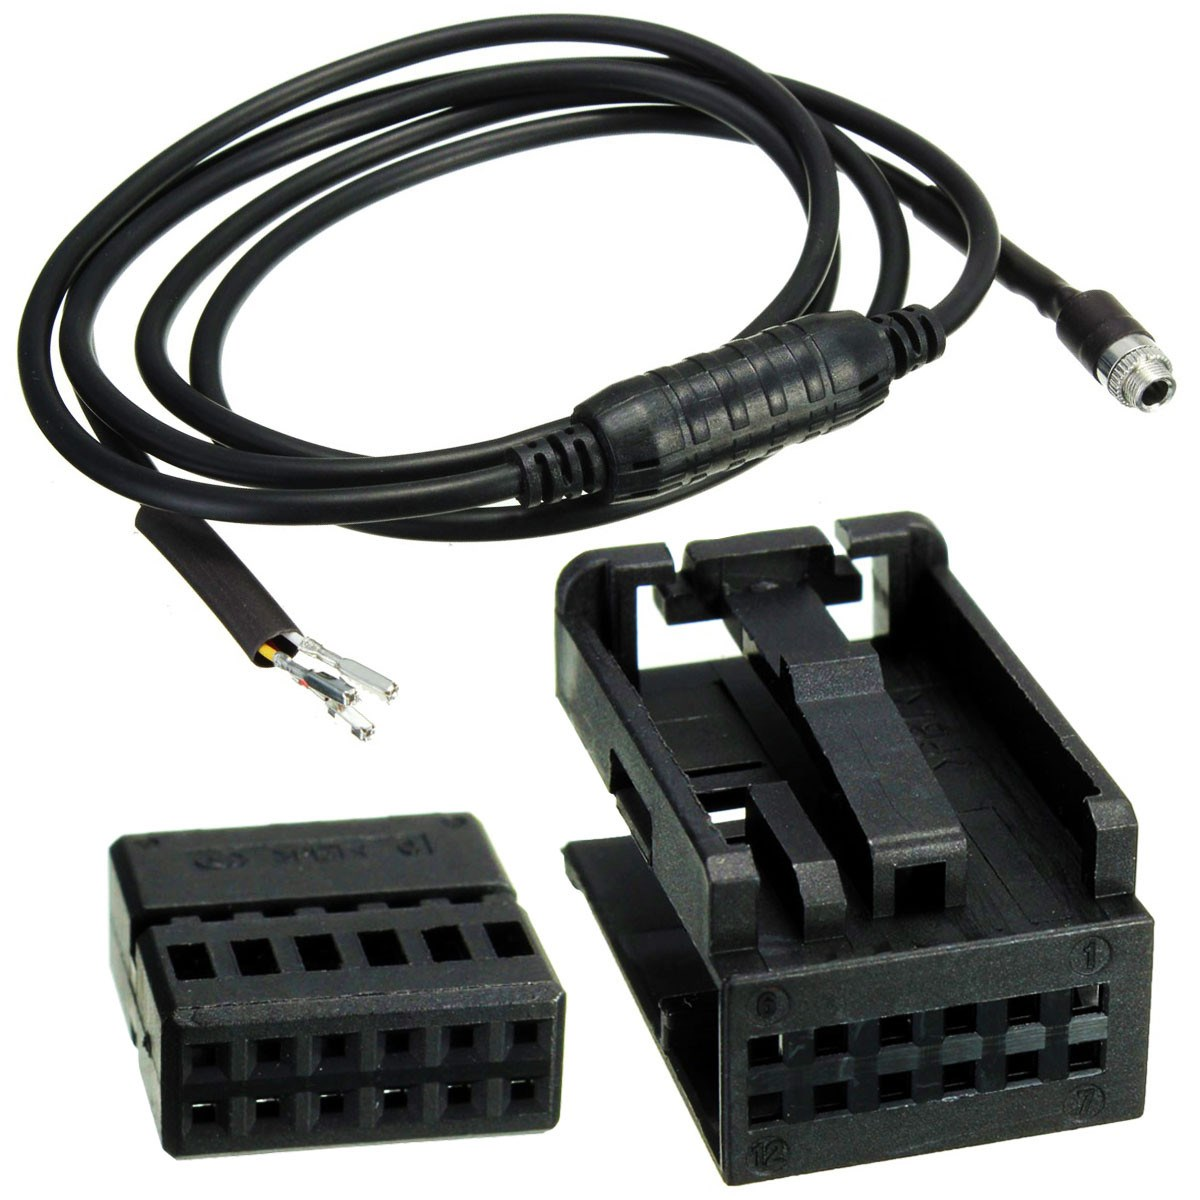 2019 Upgrade 3.5mm Plug 3ft Cord Black Universal Car Audio Cassette Adapter IC-900